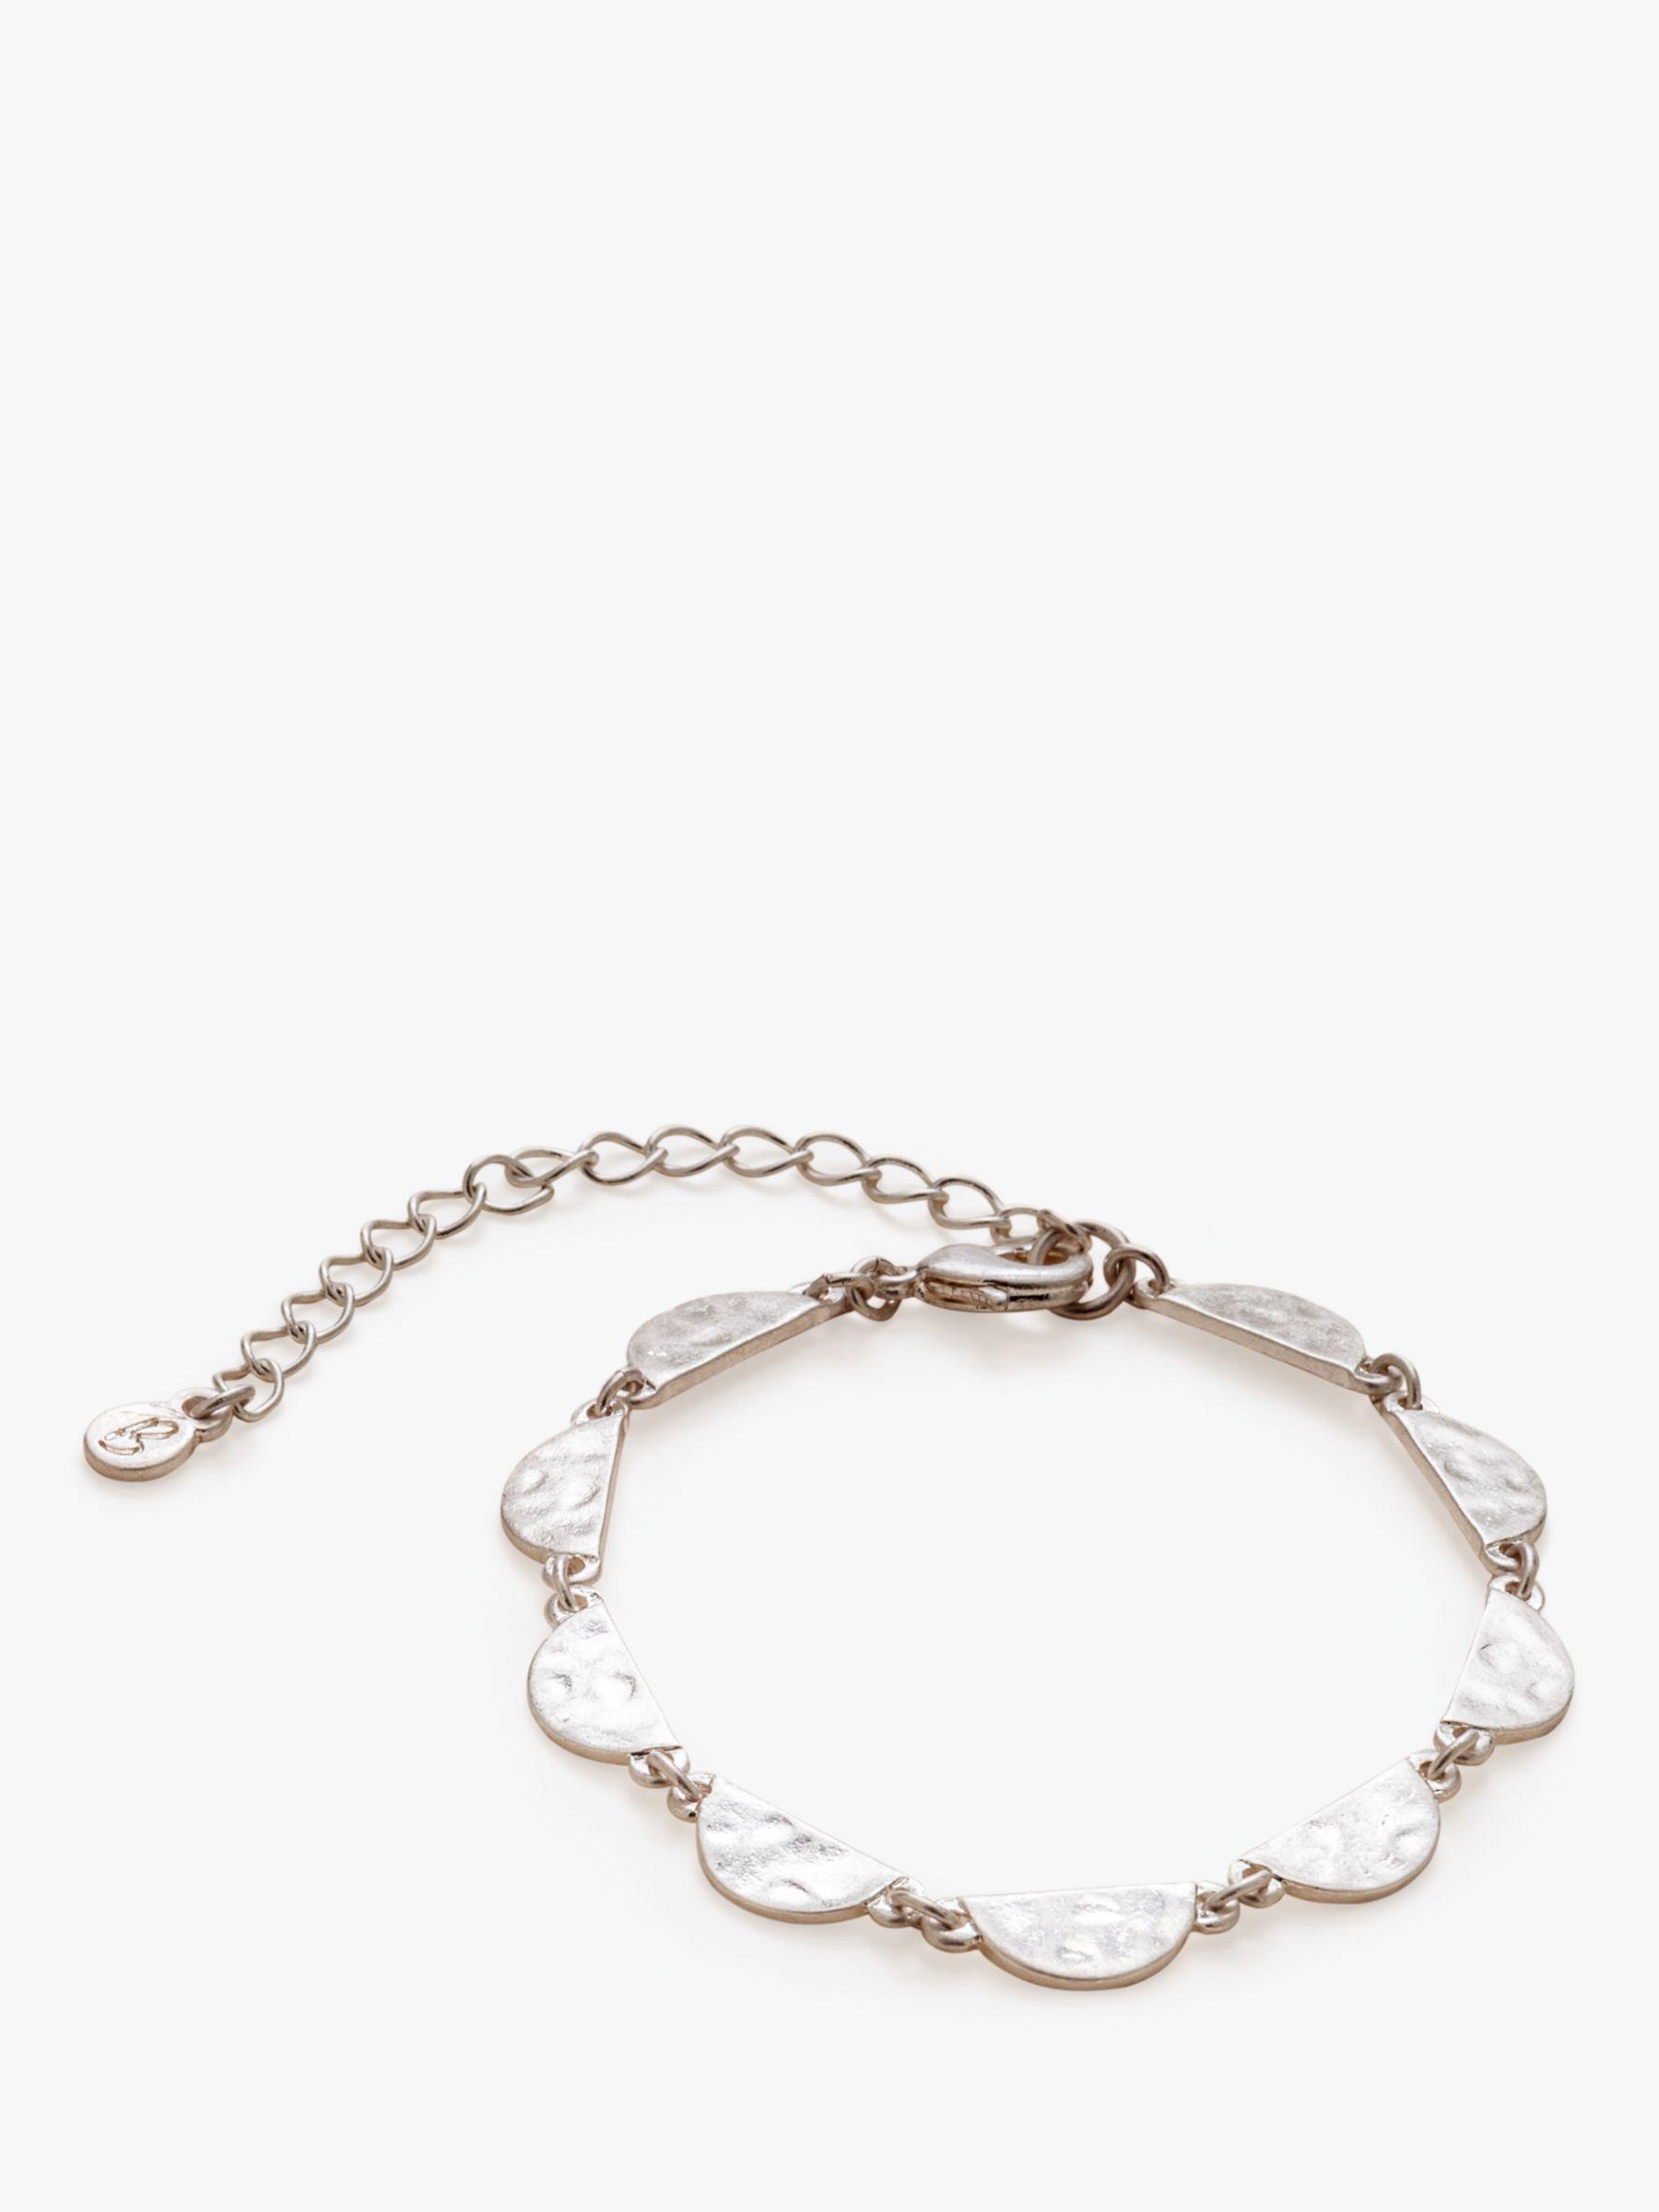 Boden Boden Scallop Bracelet